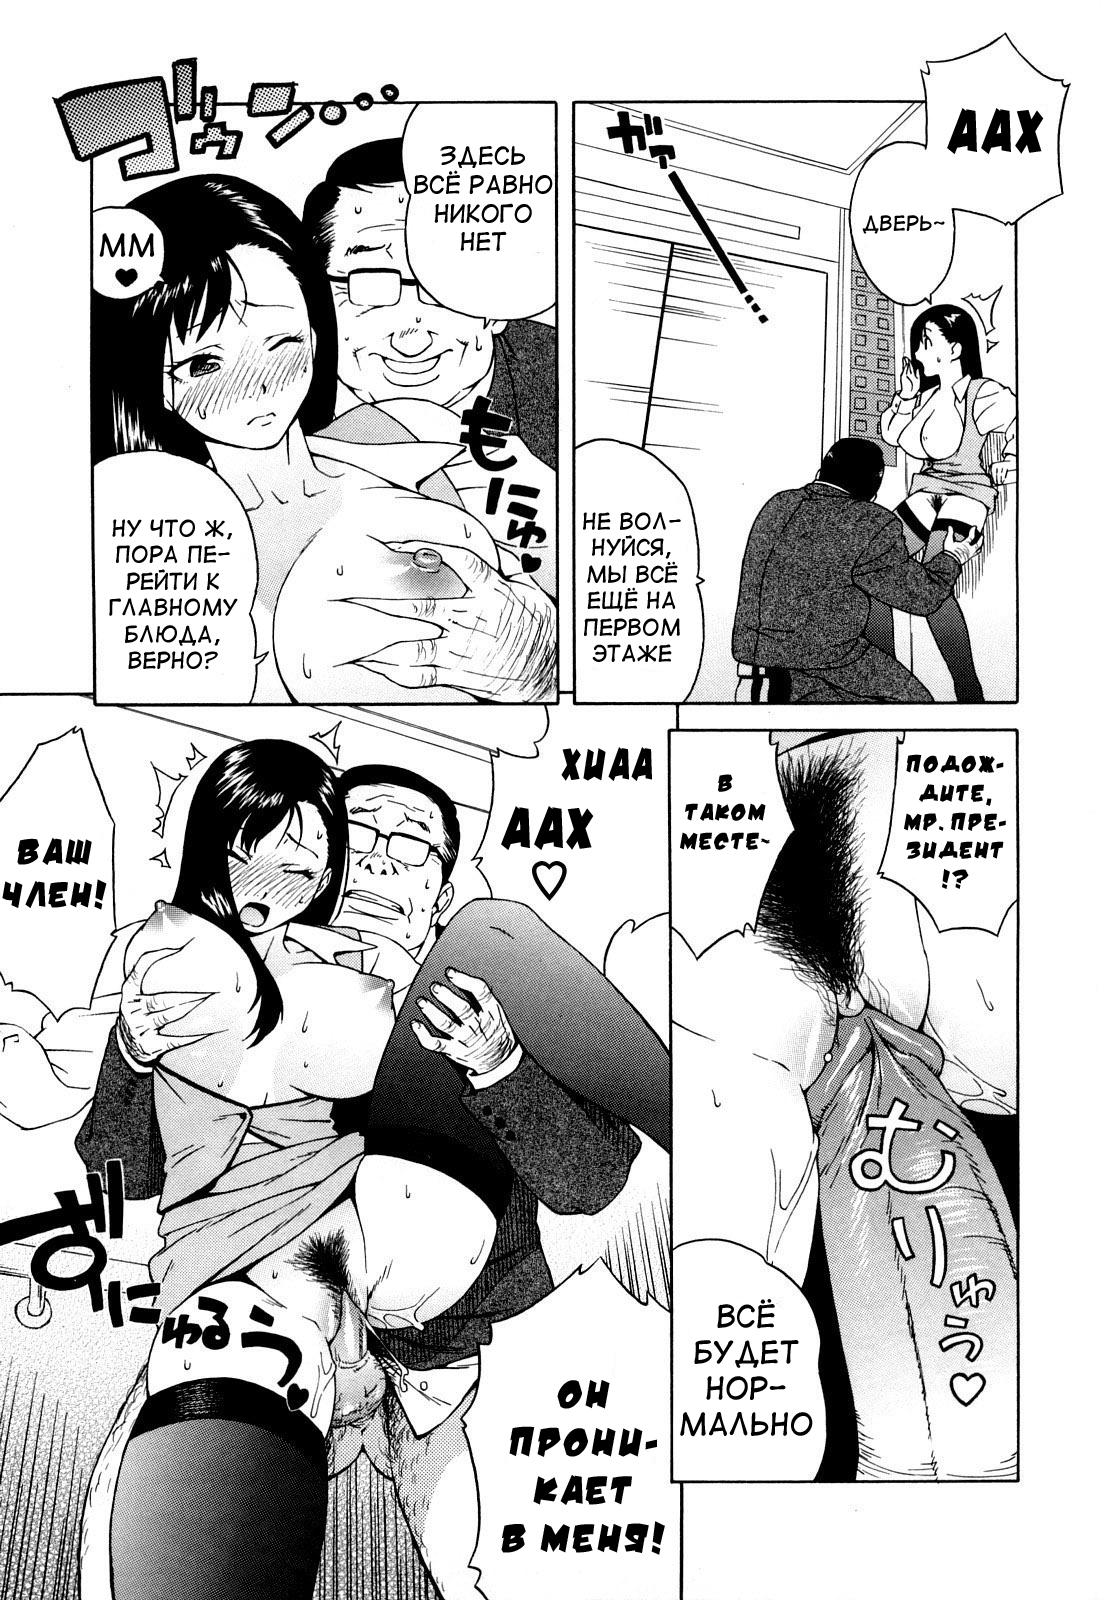 Хентай секс лифт 1 фотография